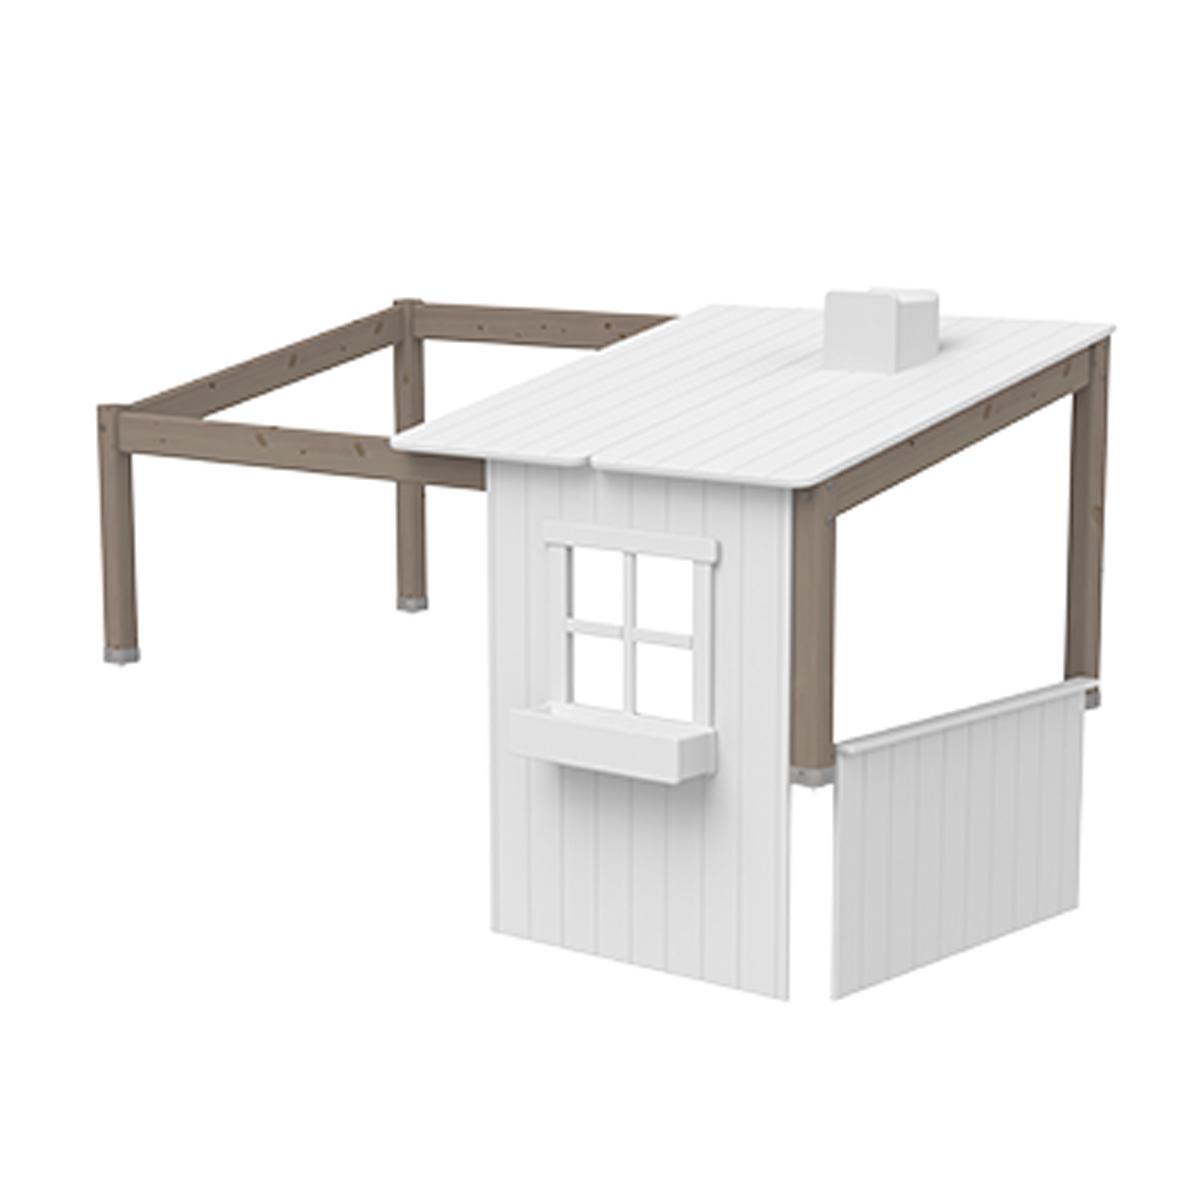 Structure toit lit cabane 200cm 1/2 PLAY HOUSE CLASSIC Flexa terra-blanc